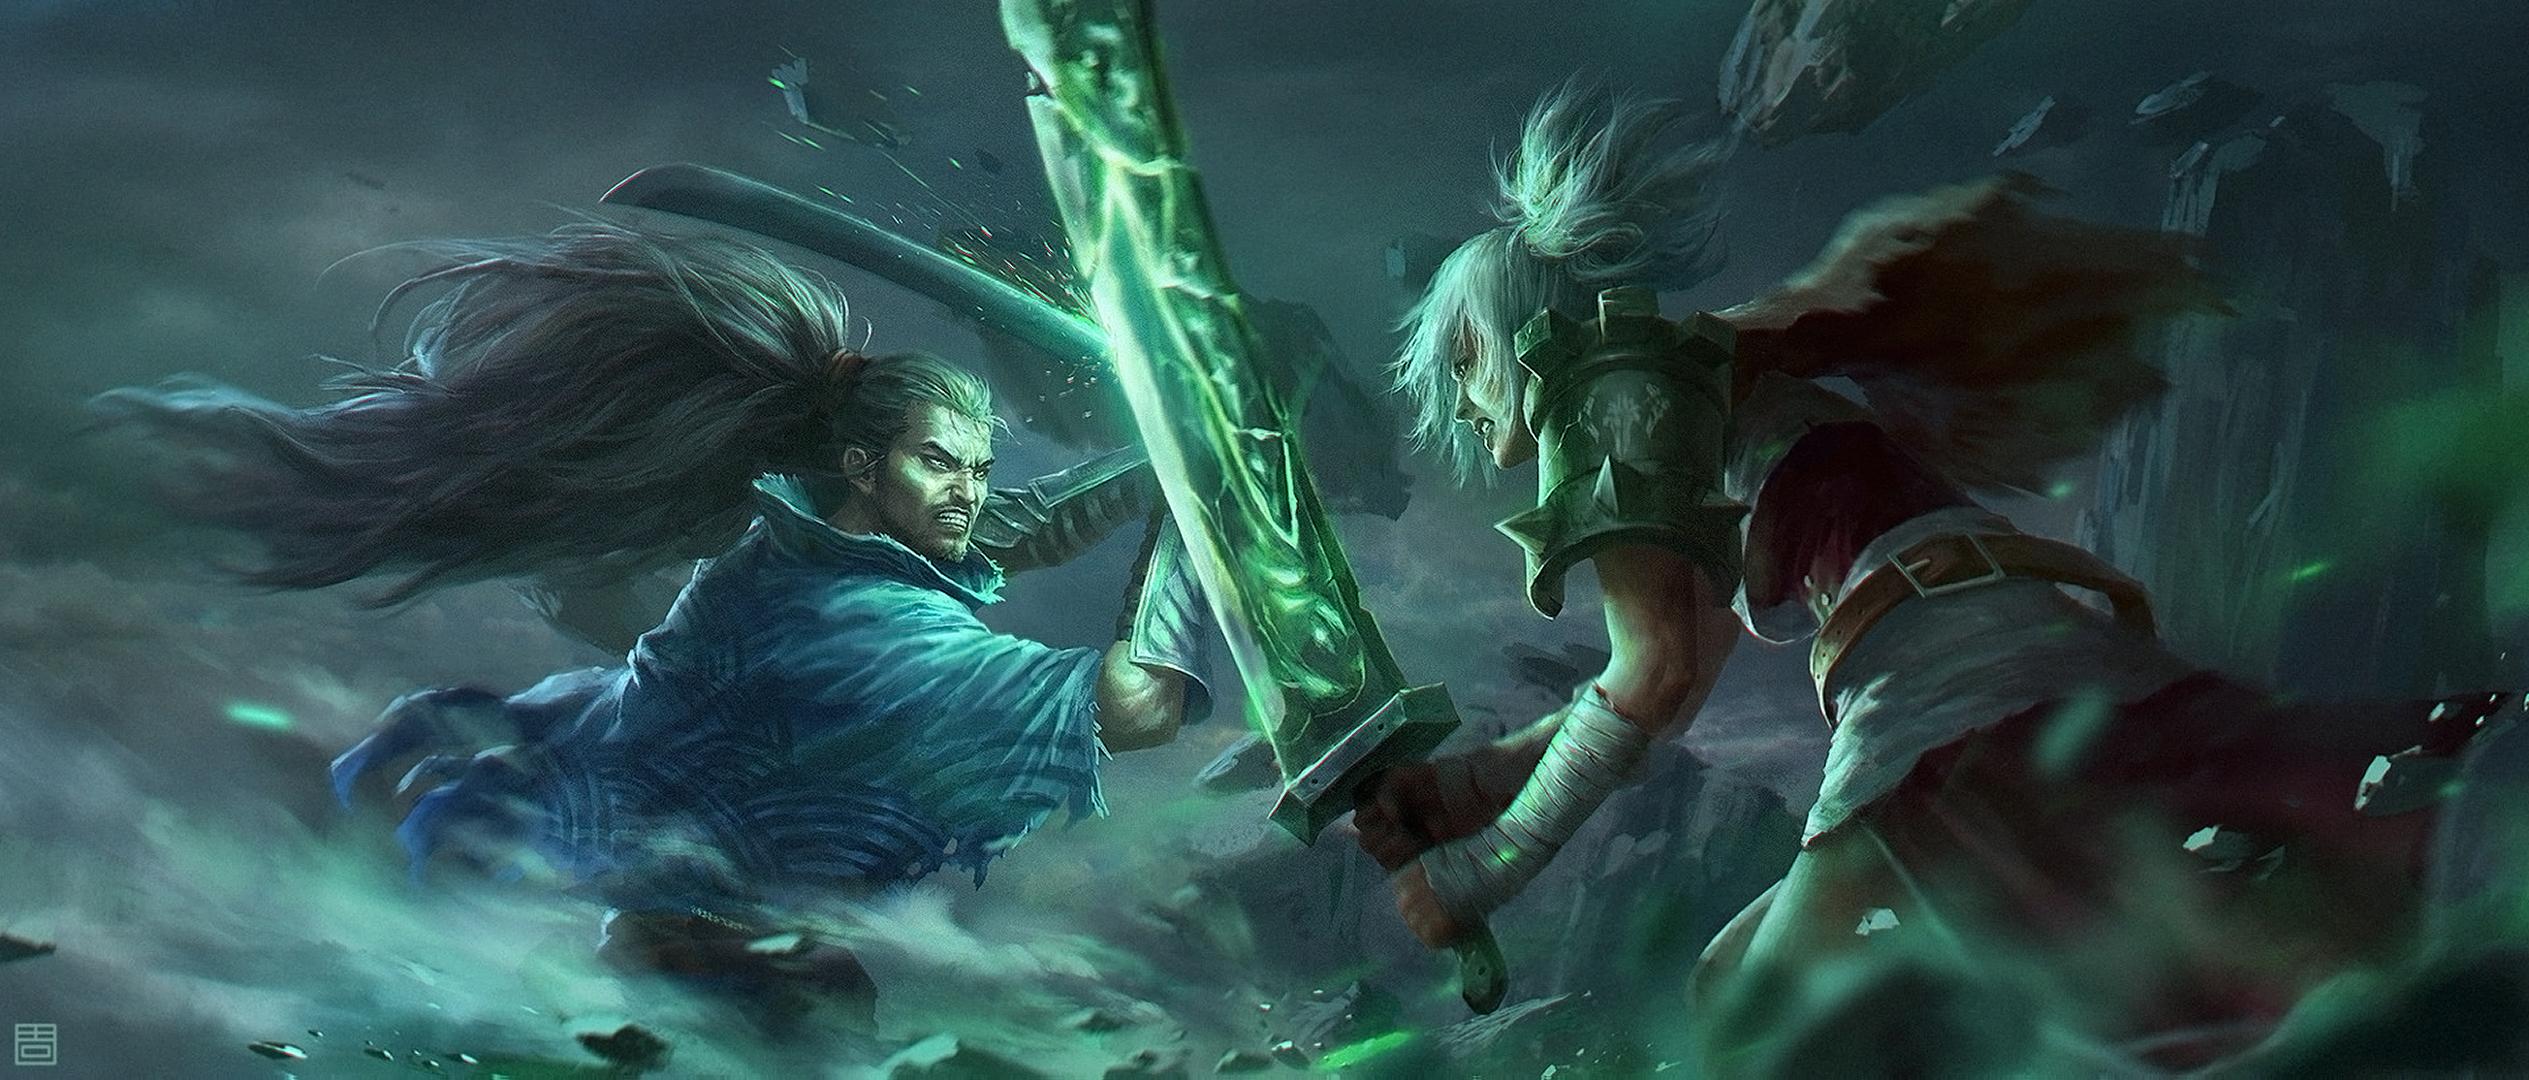 League Of Legends Papel de Parede HD  Plano de Fundo  2529x1080  ID:887234  Wallpaper Abyss